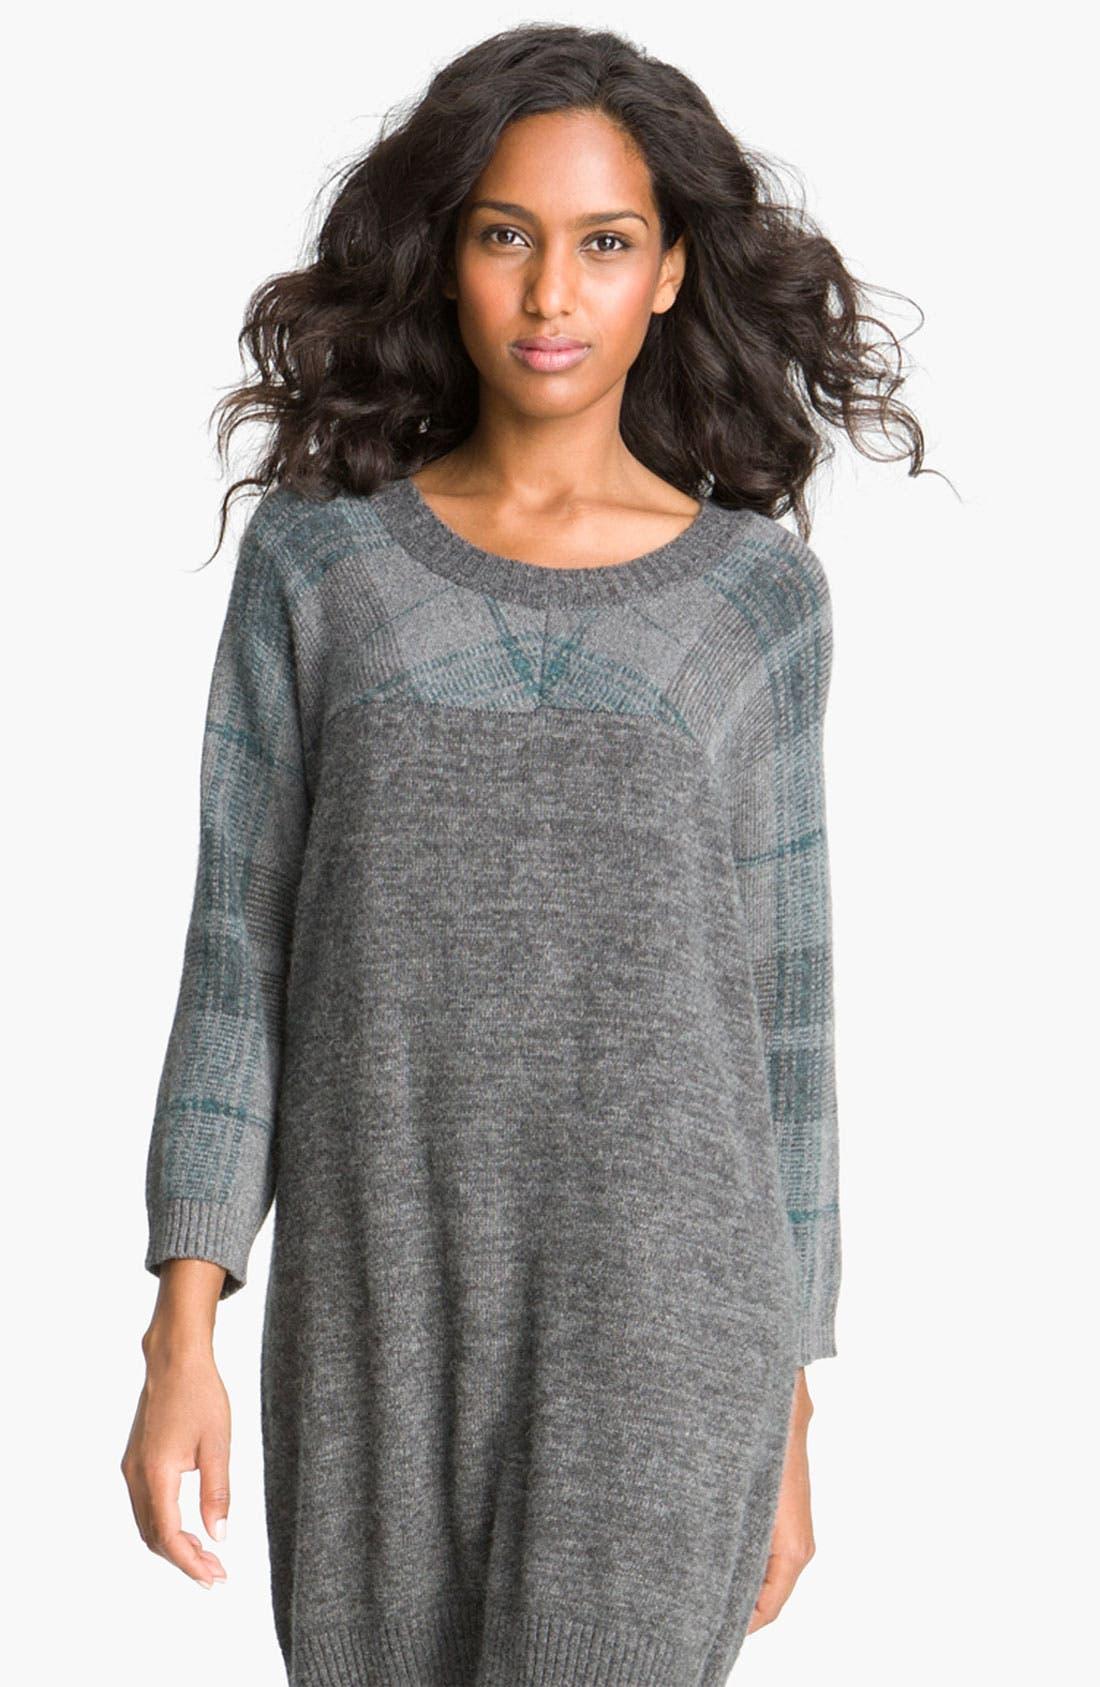 Alternate Image 1 Selected - Weekend Max Mara 'Sumero' Sweater Dress